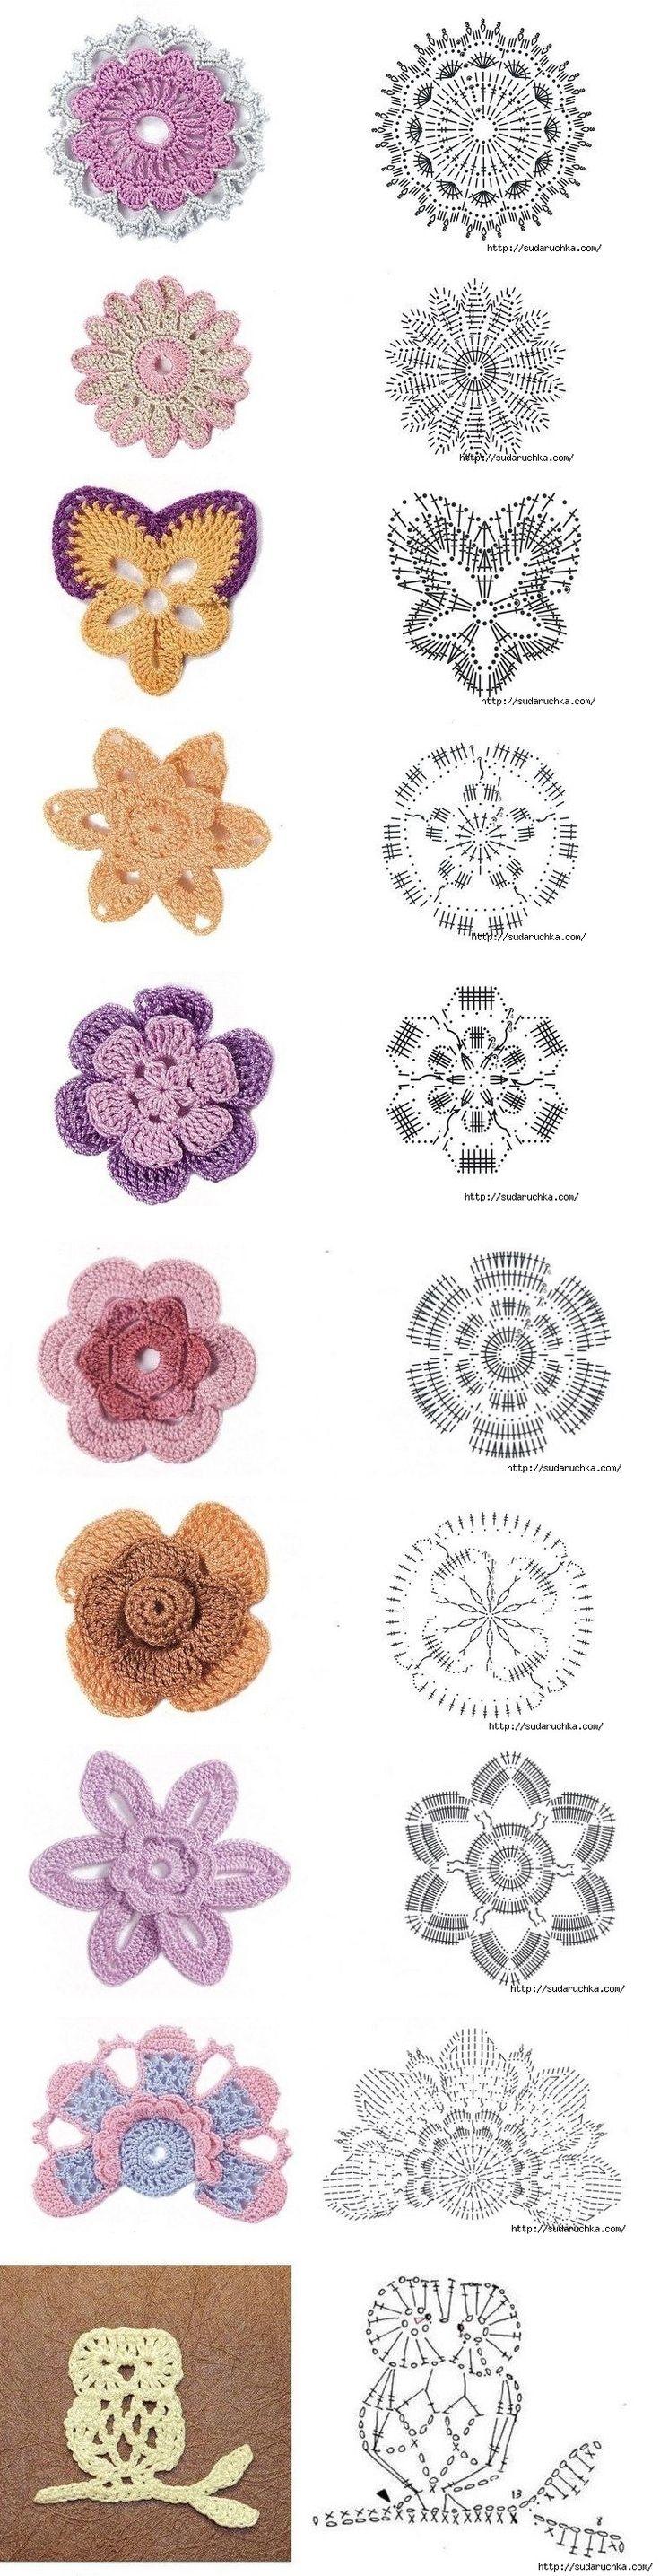 best Stitches u aplication images on Pinterest Hand crafts